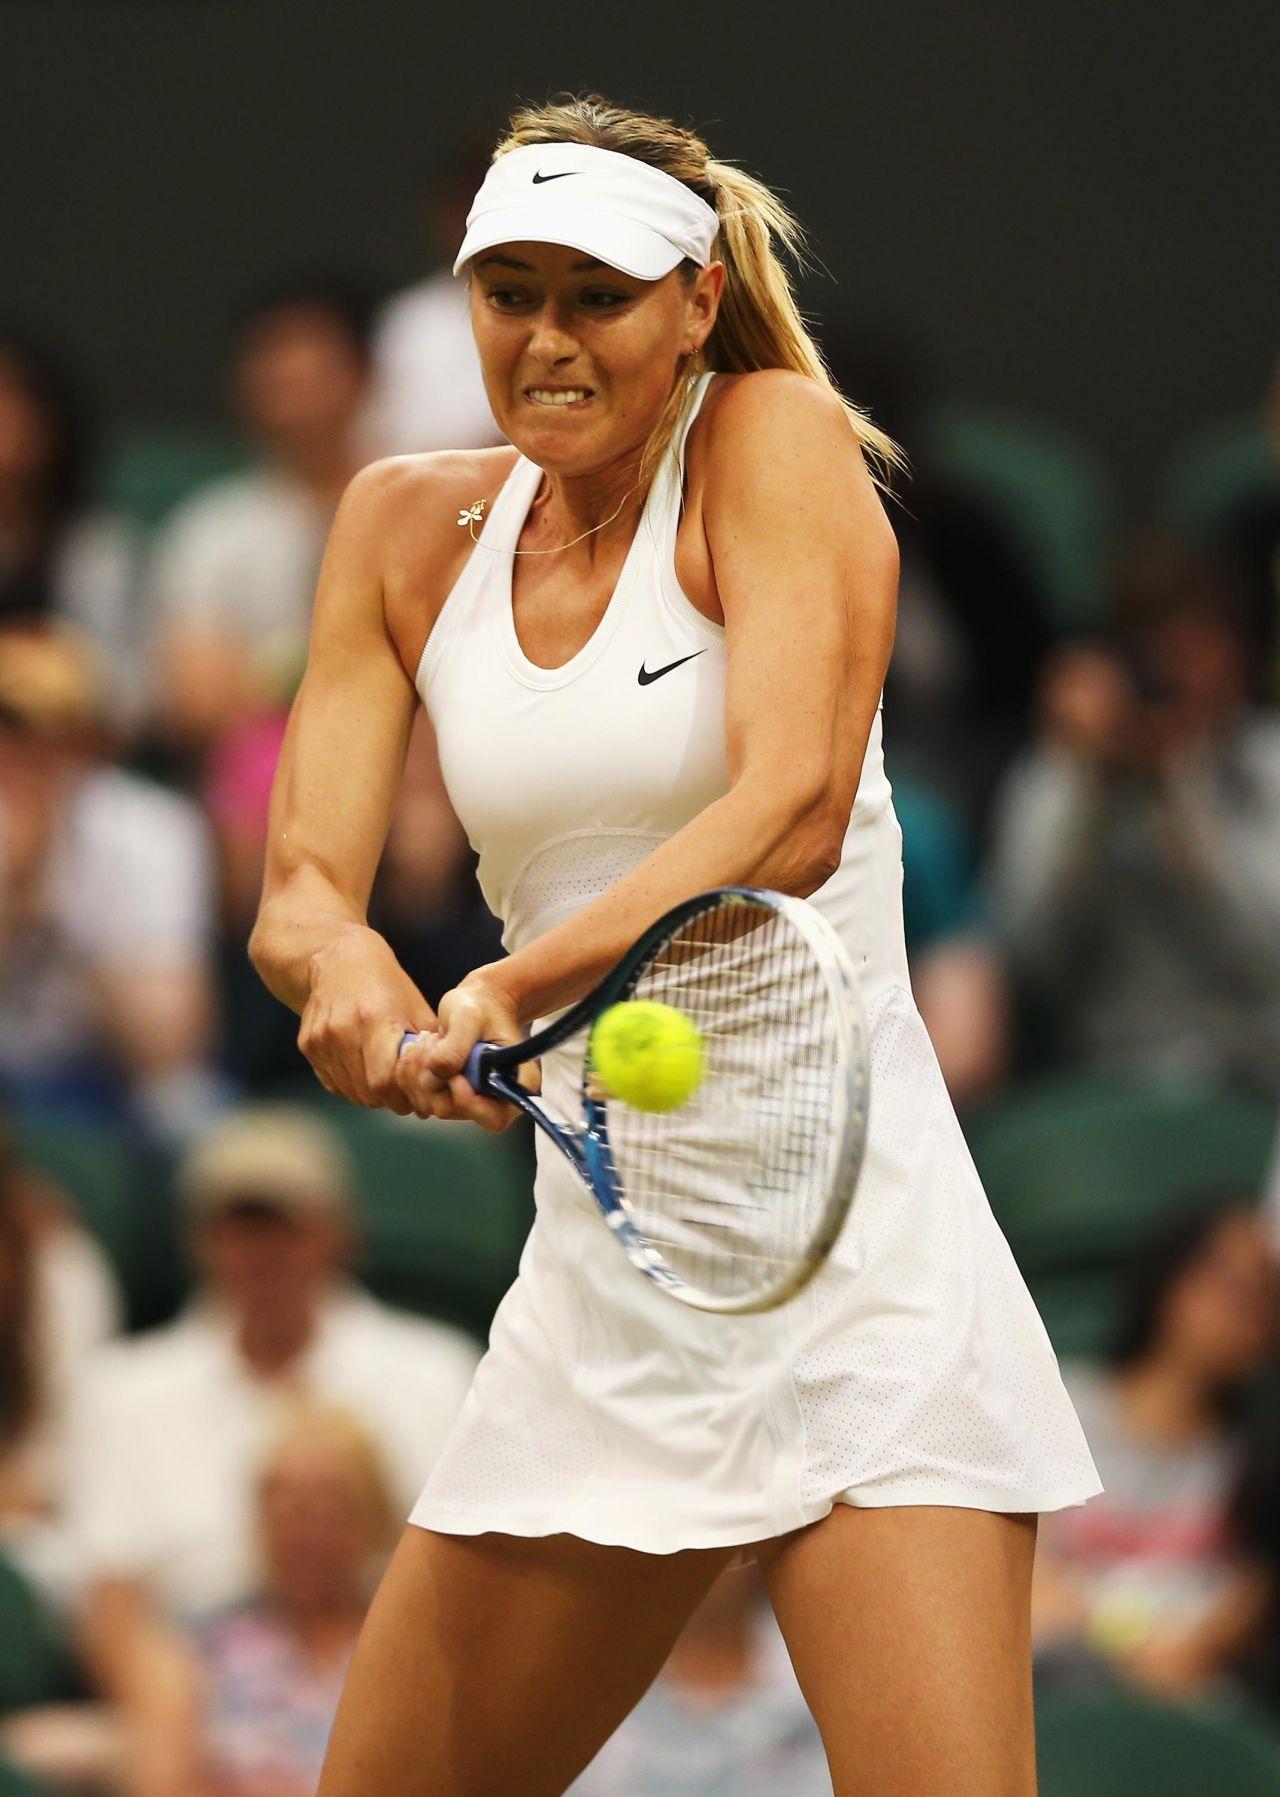 Maria Sharapova - Wimbledon Tournament 2015 - First Round